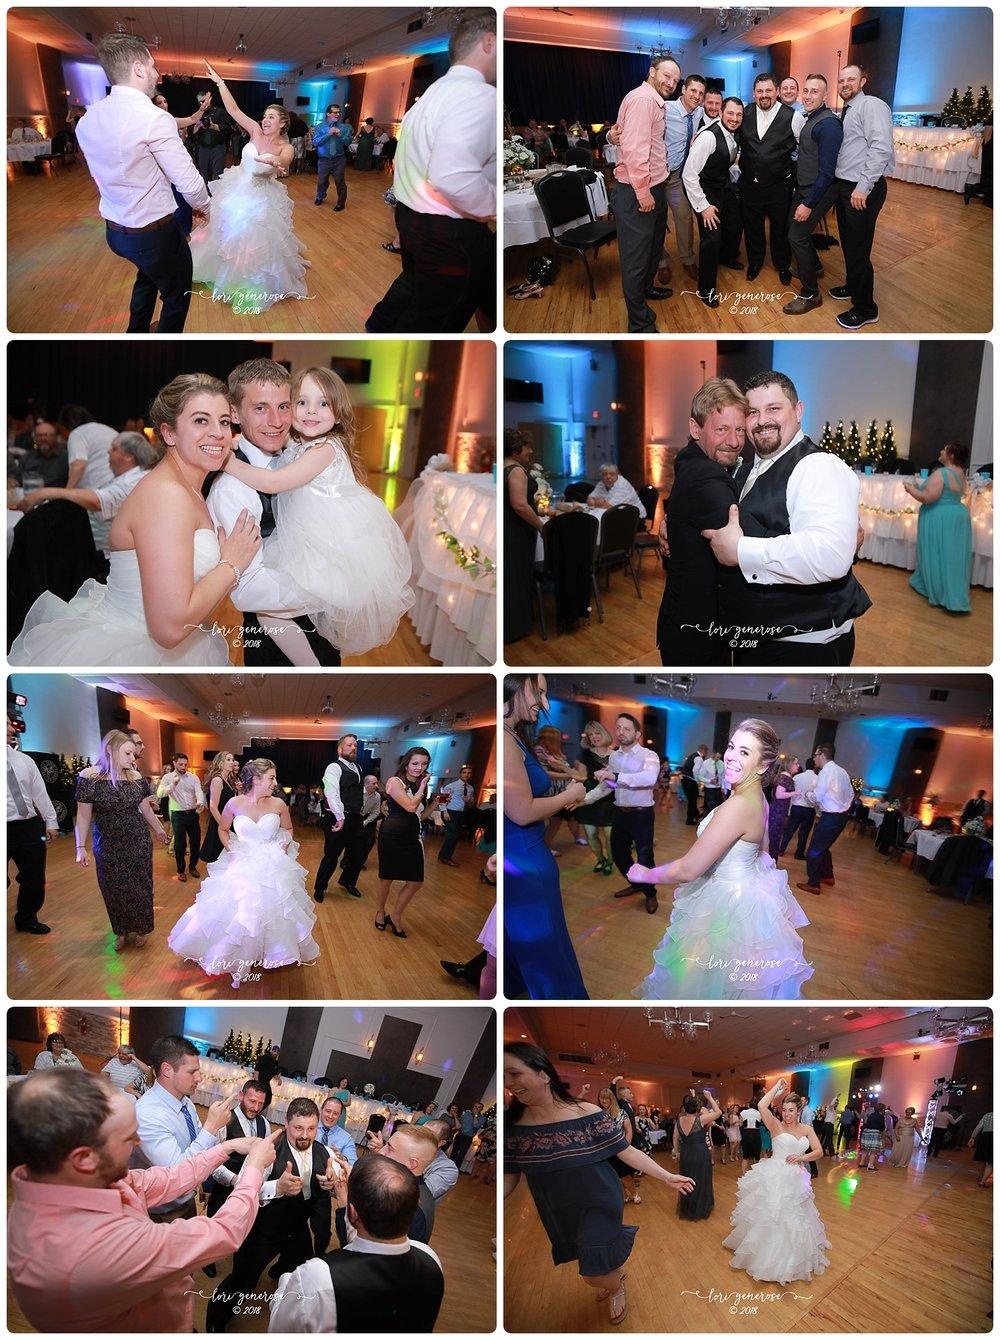 weddingreceptiondancingbrideandgroomreceptionatnorthamptoncommunitycenternorthamptonpalgphotography.jpg